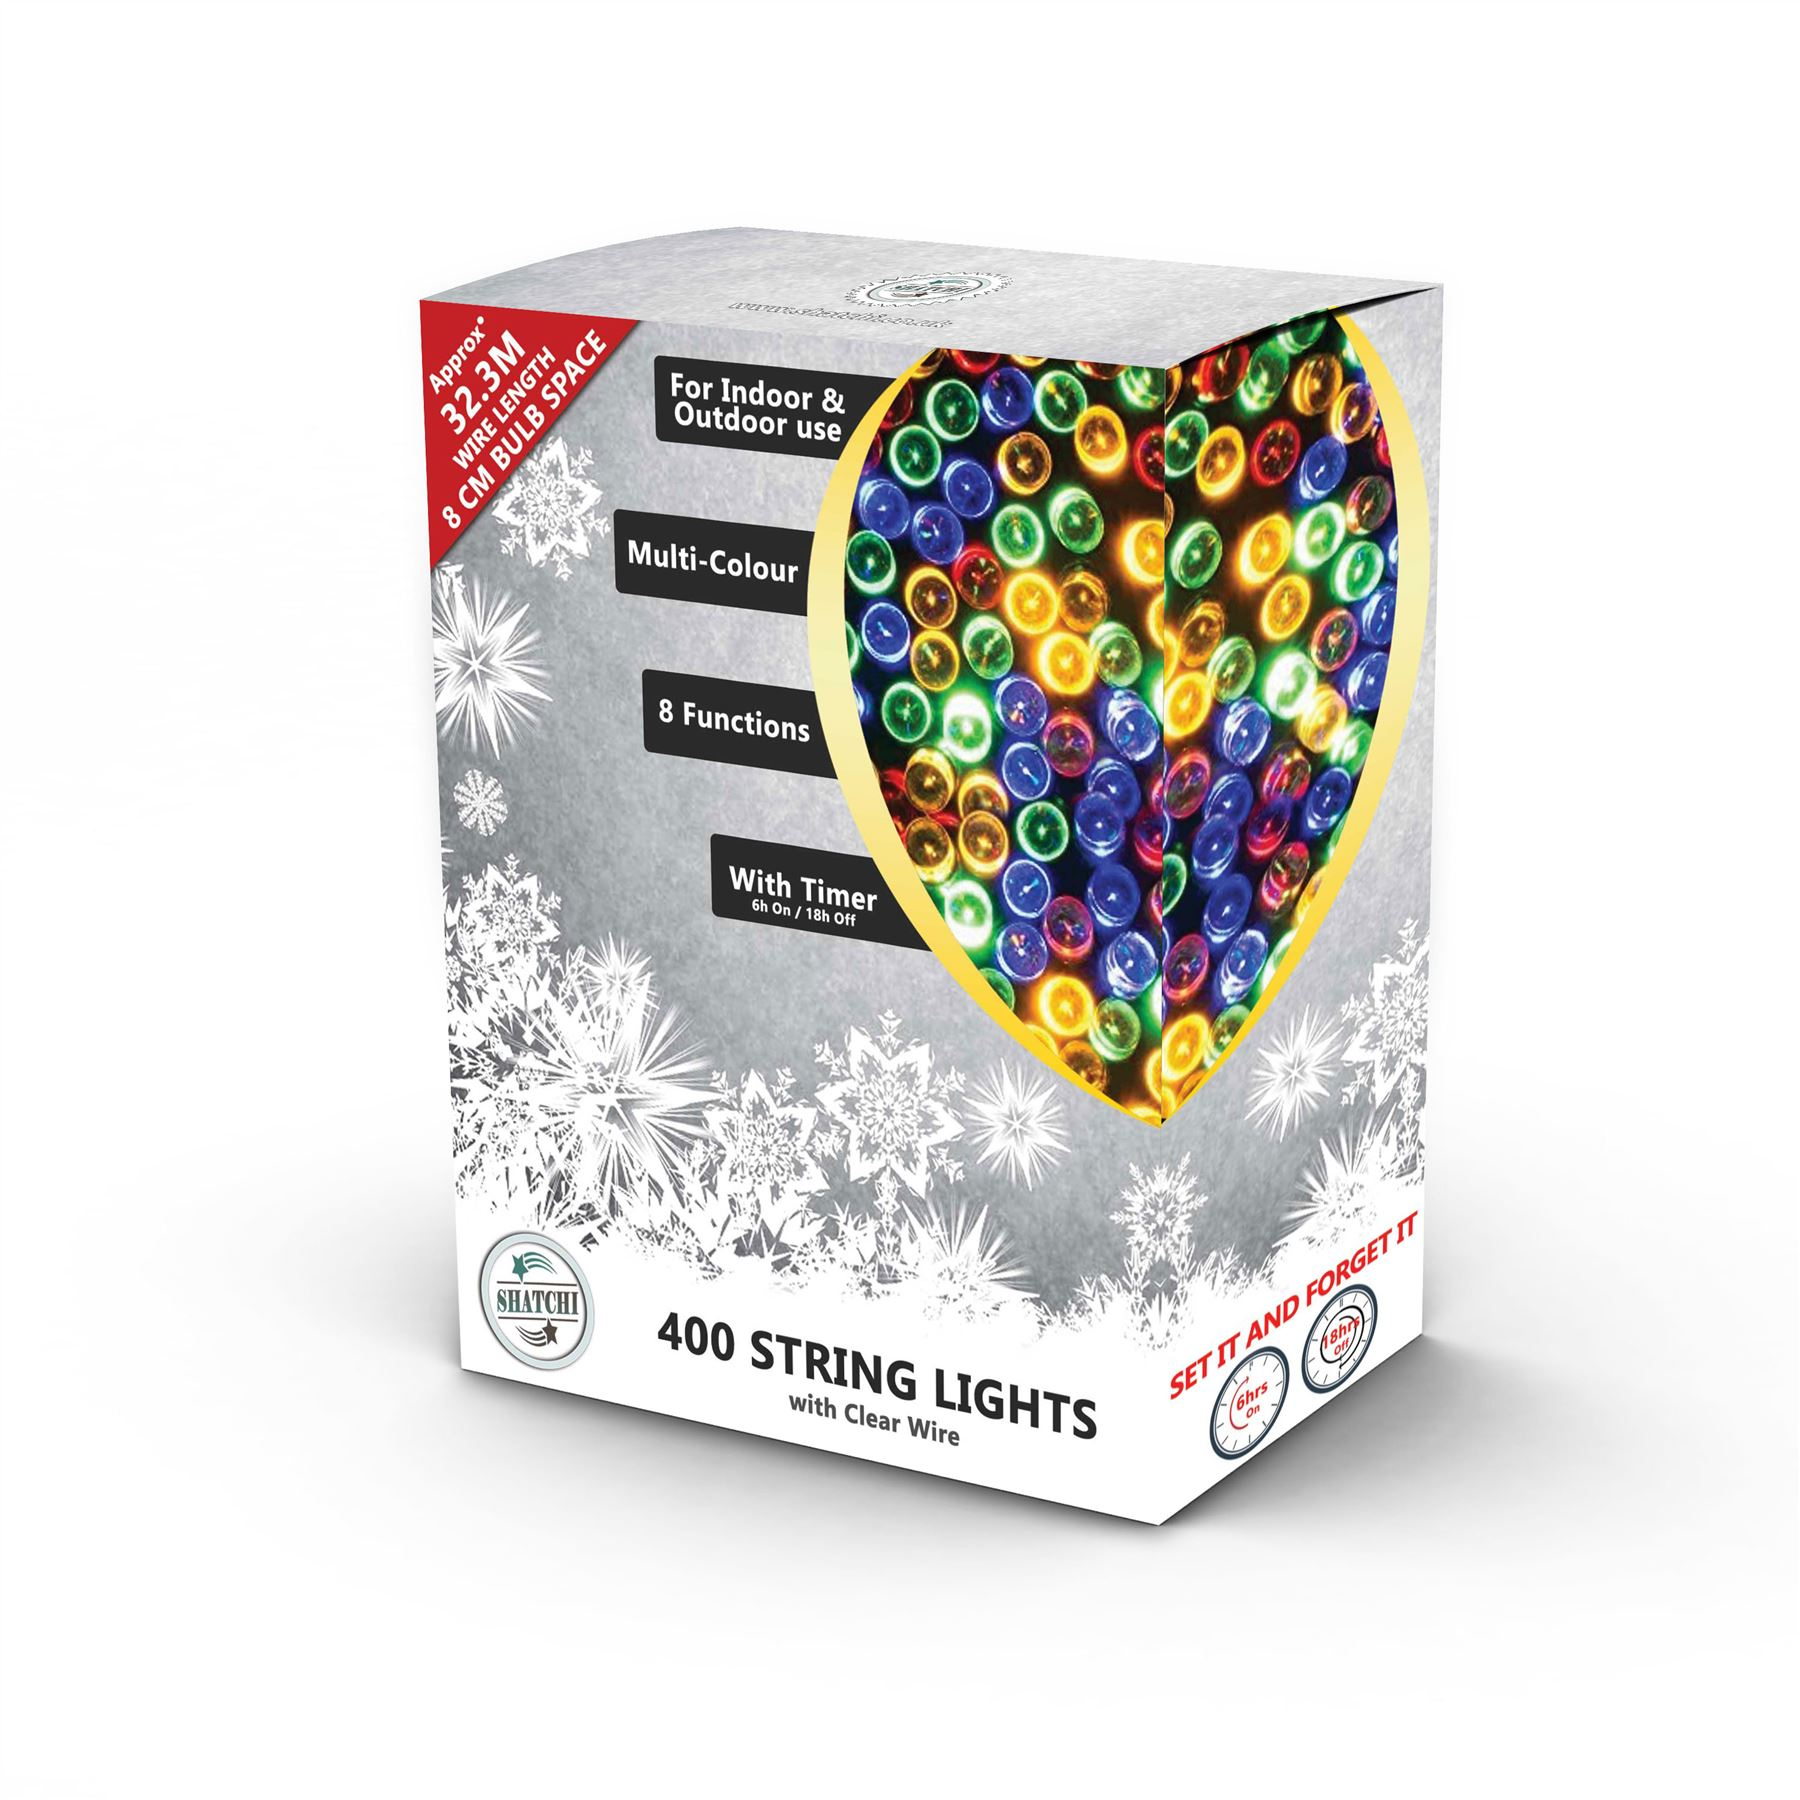 100-200-300-400-500-LED-Christmas-String-Fairy-Lights-Xmas-Decorations-Tree miniature 29